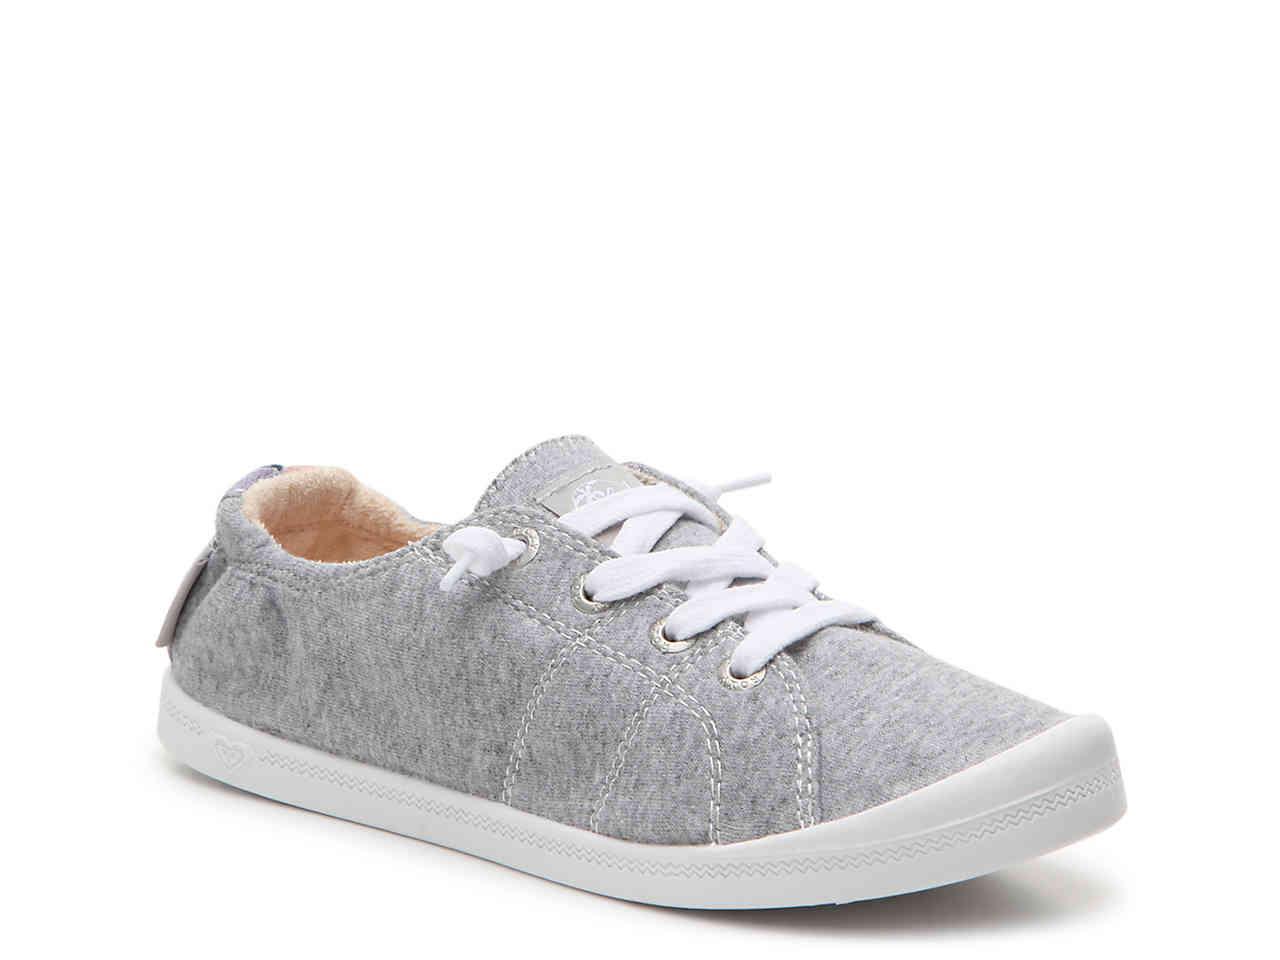 b4165c1ffb34 Lyst - Roxy Bayshore Iii Slip-on Sneaker in Gray